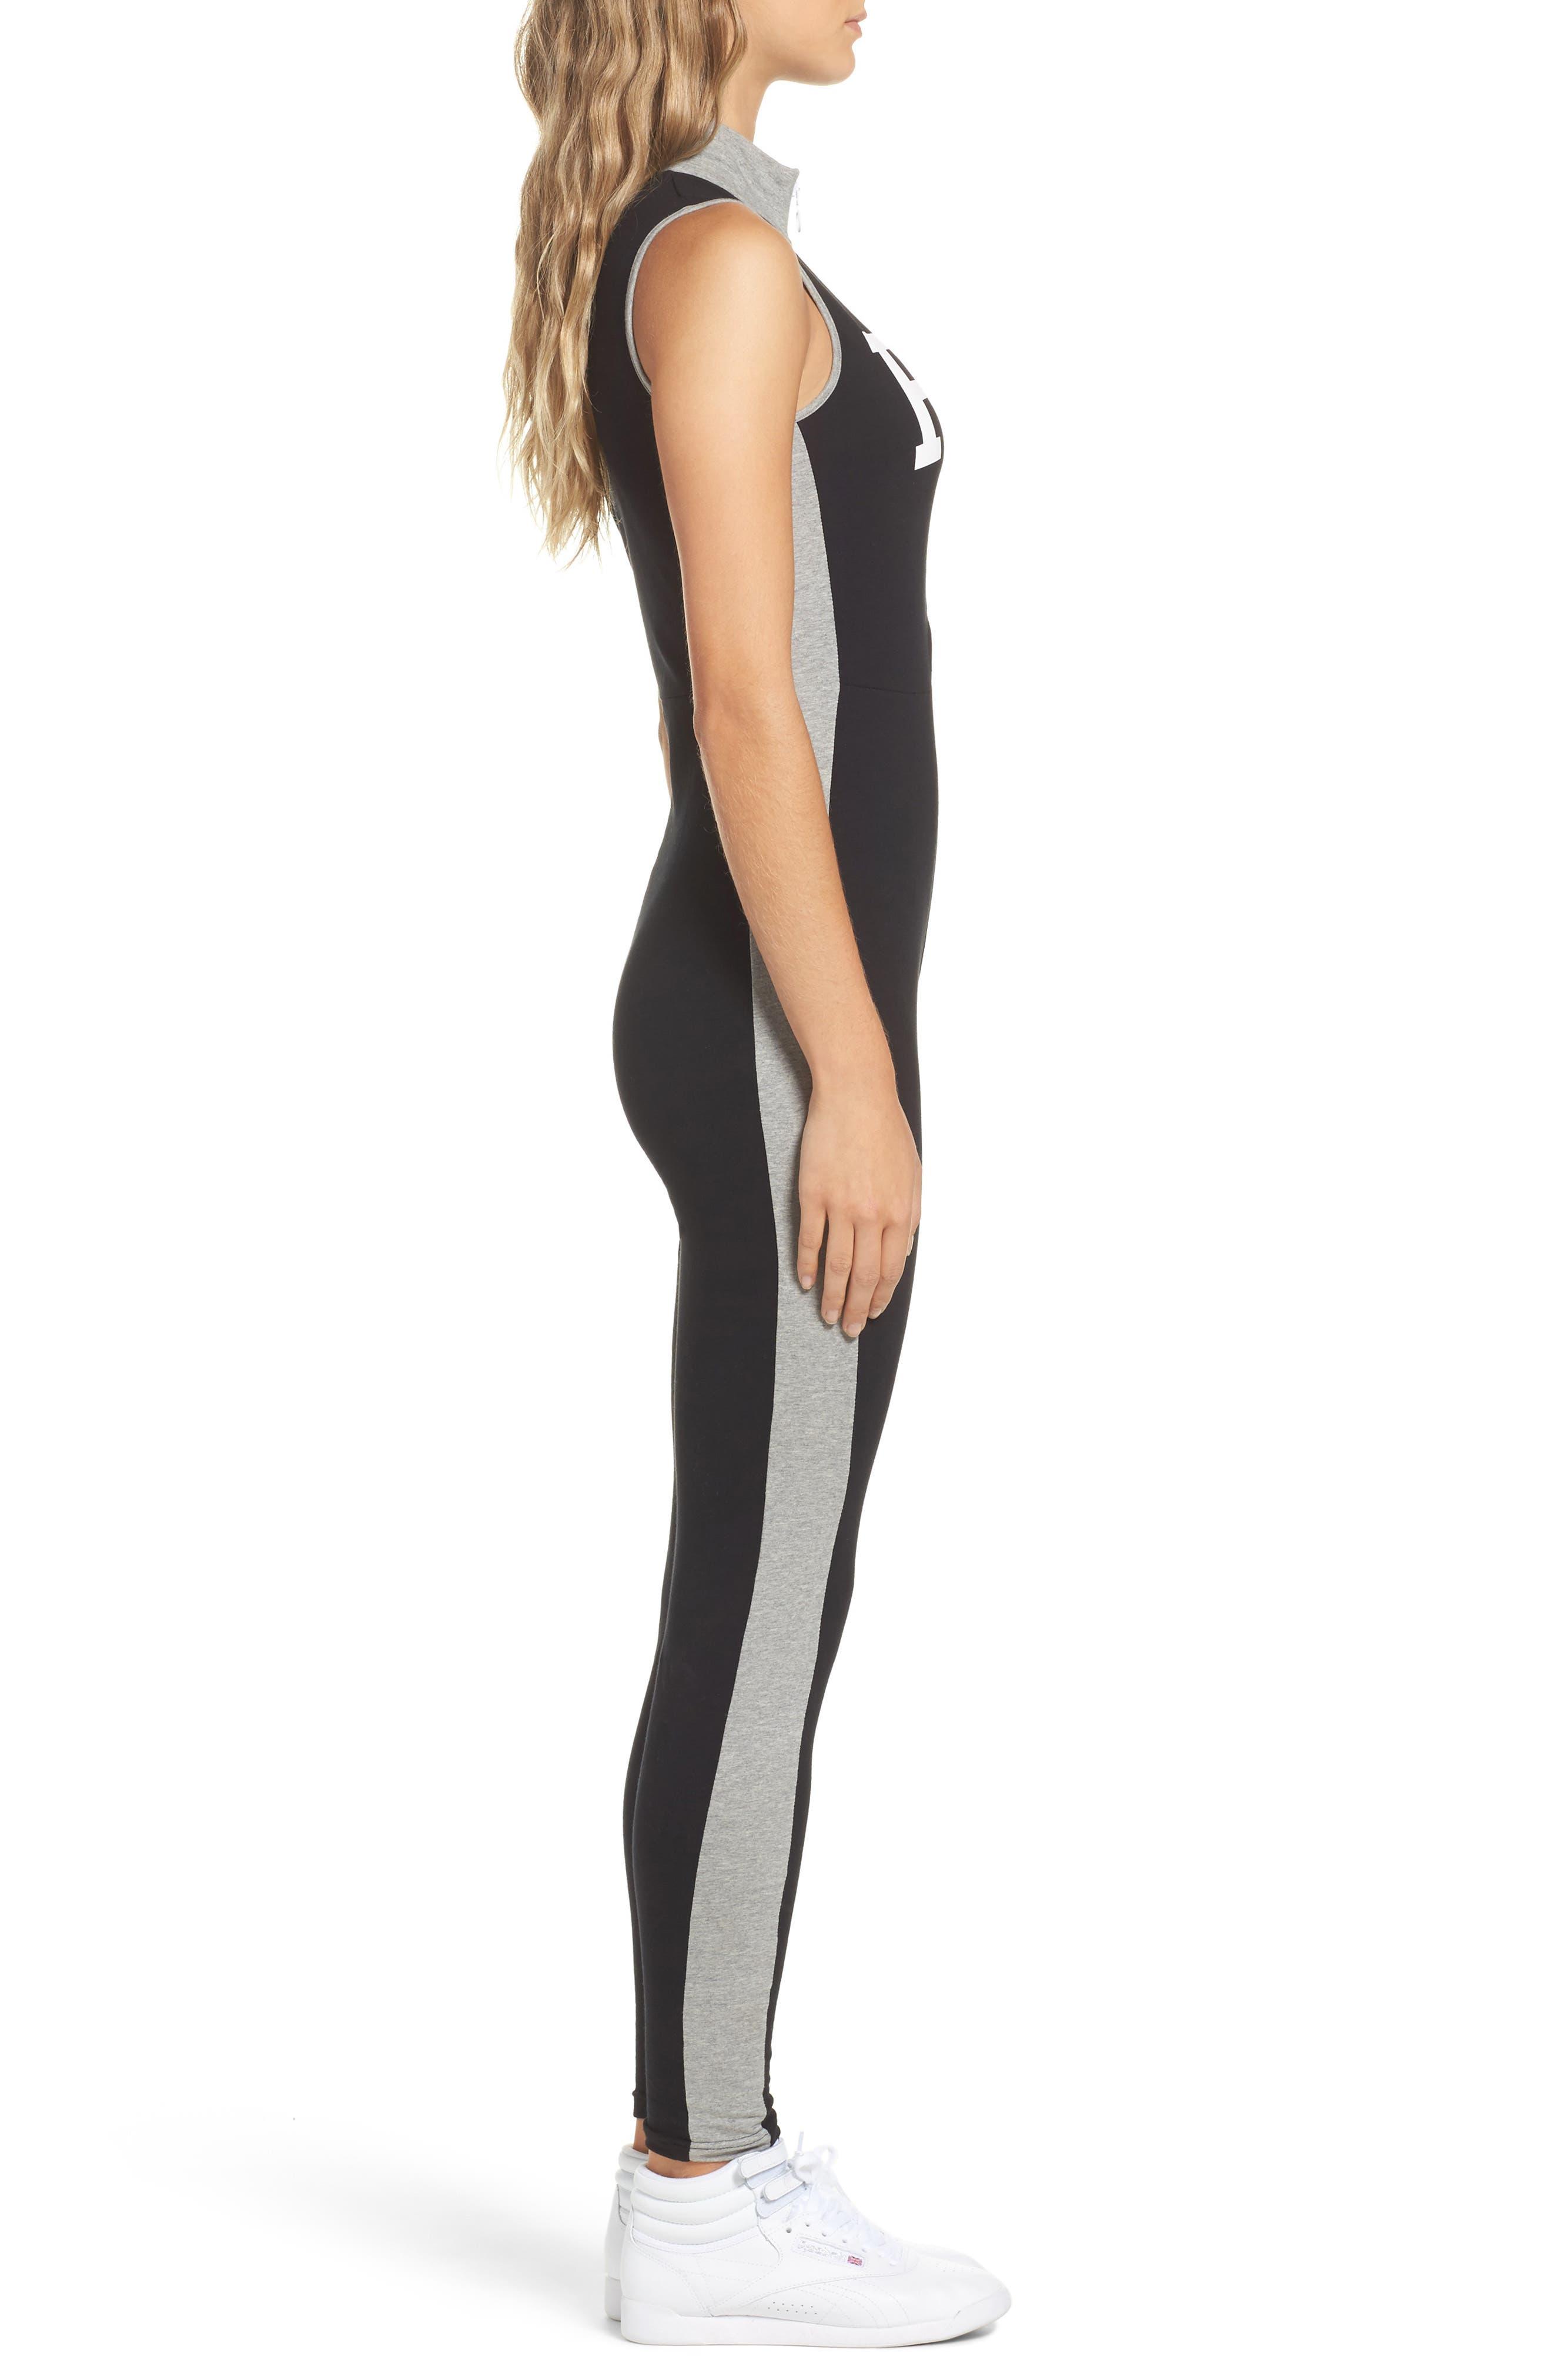 Roseann Jumpsuit,                             Alternate thumbnail 3, color,                             Black/ Grey Heather/ White